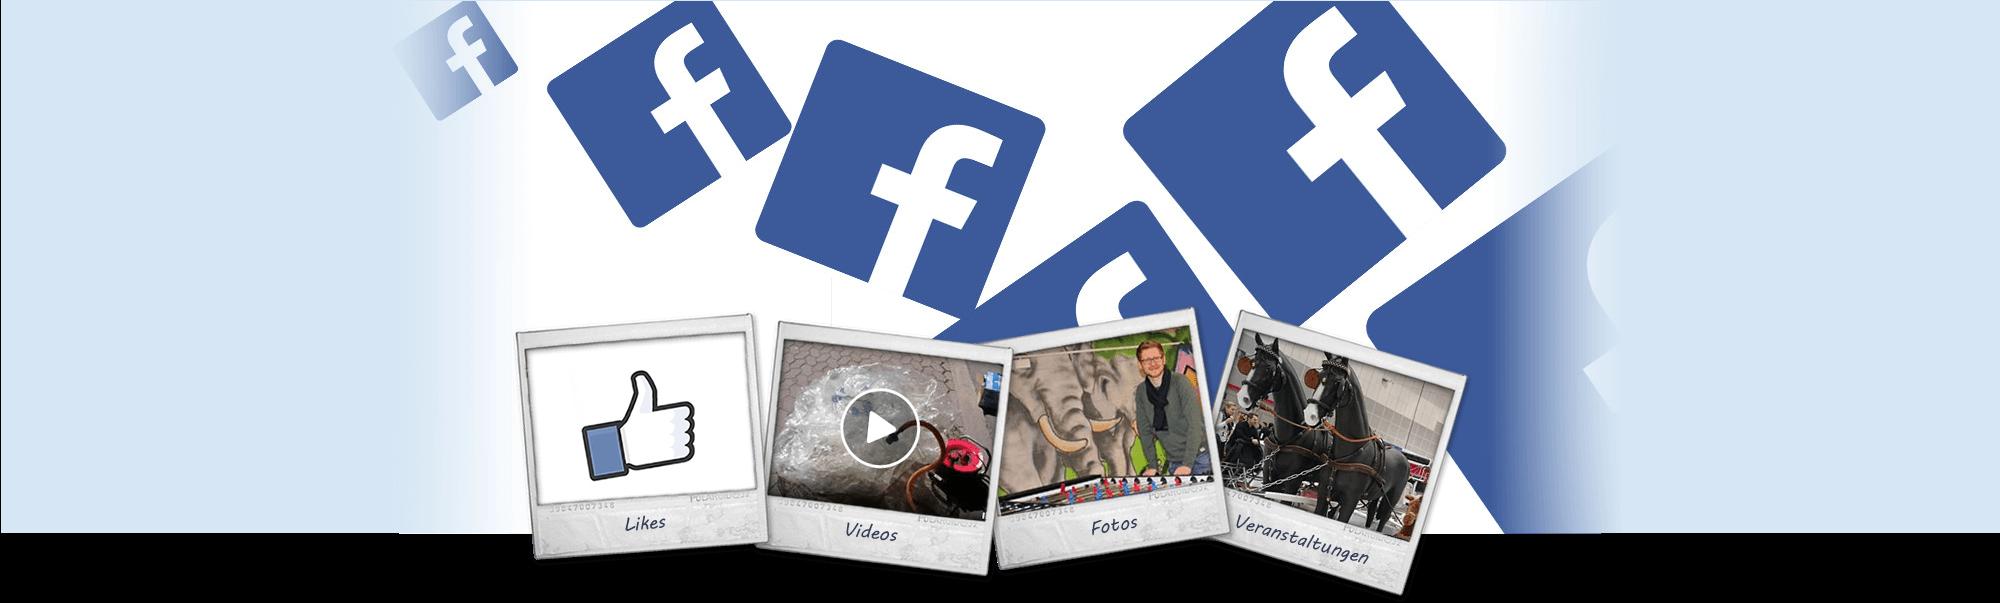 Slide-Facebook-Event-Verleih